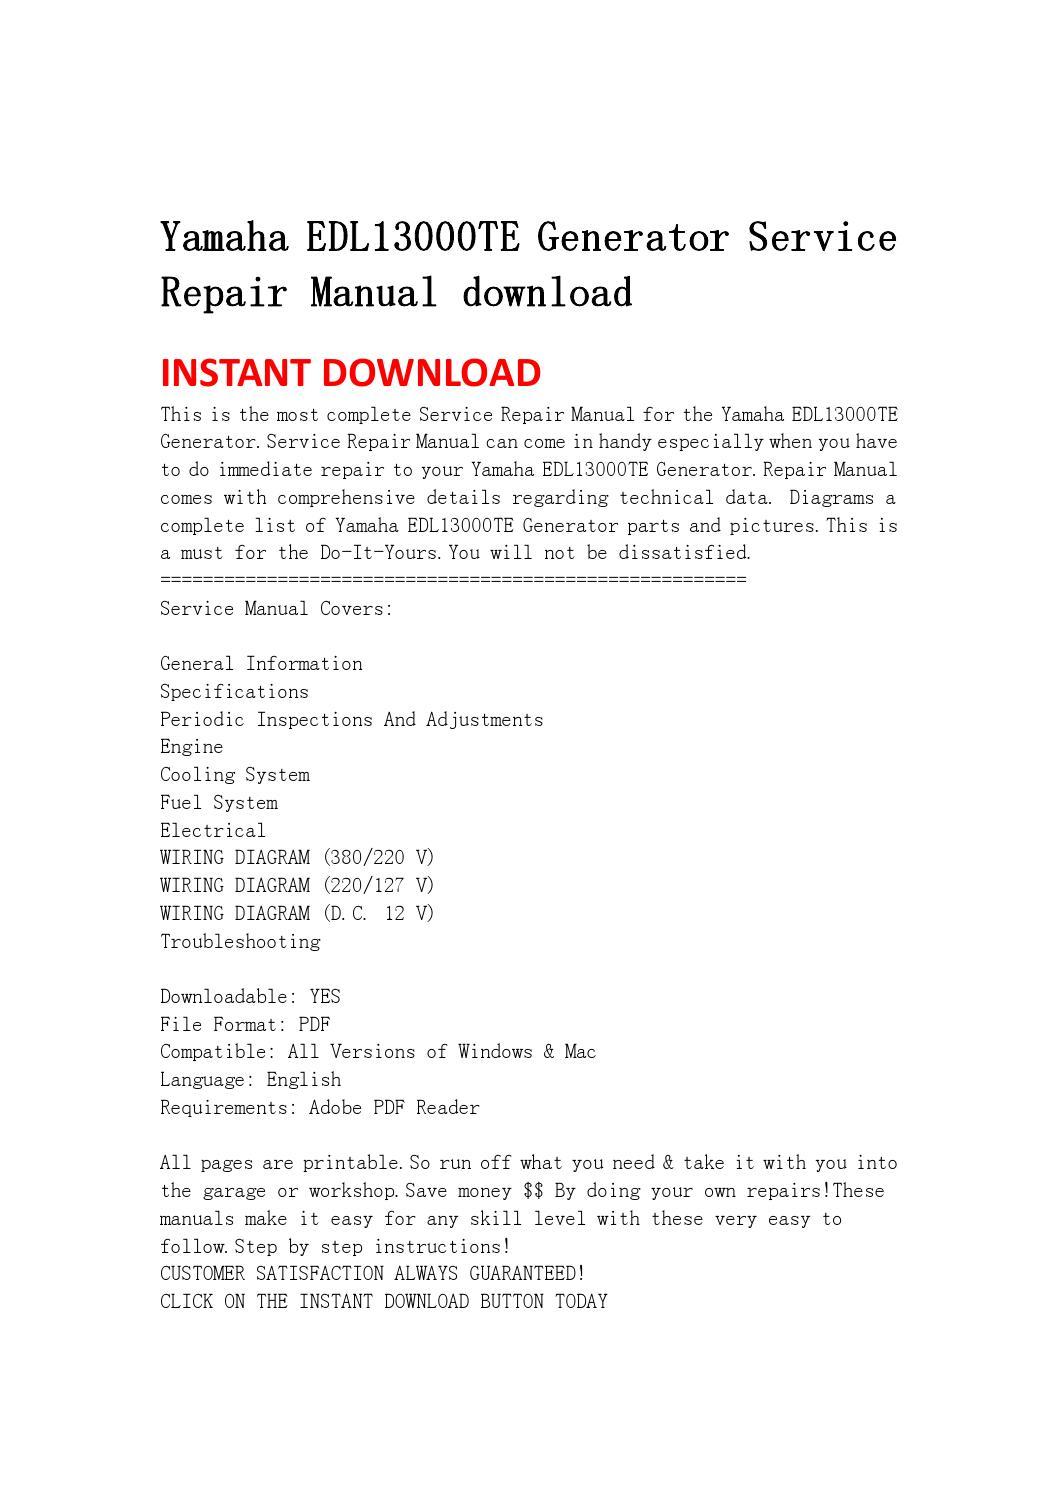 Yamaha Edl13000te Generator Service Repair Manual Download By Printable Basic Electrical Wiring Diagrams Garage Jshefjsne Issuu